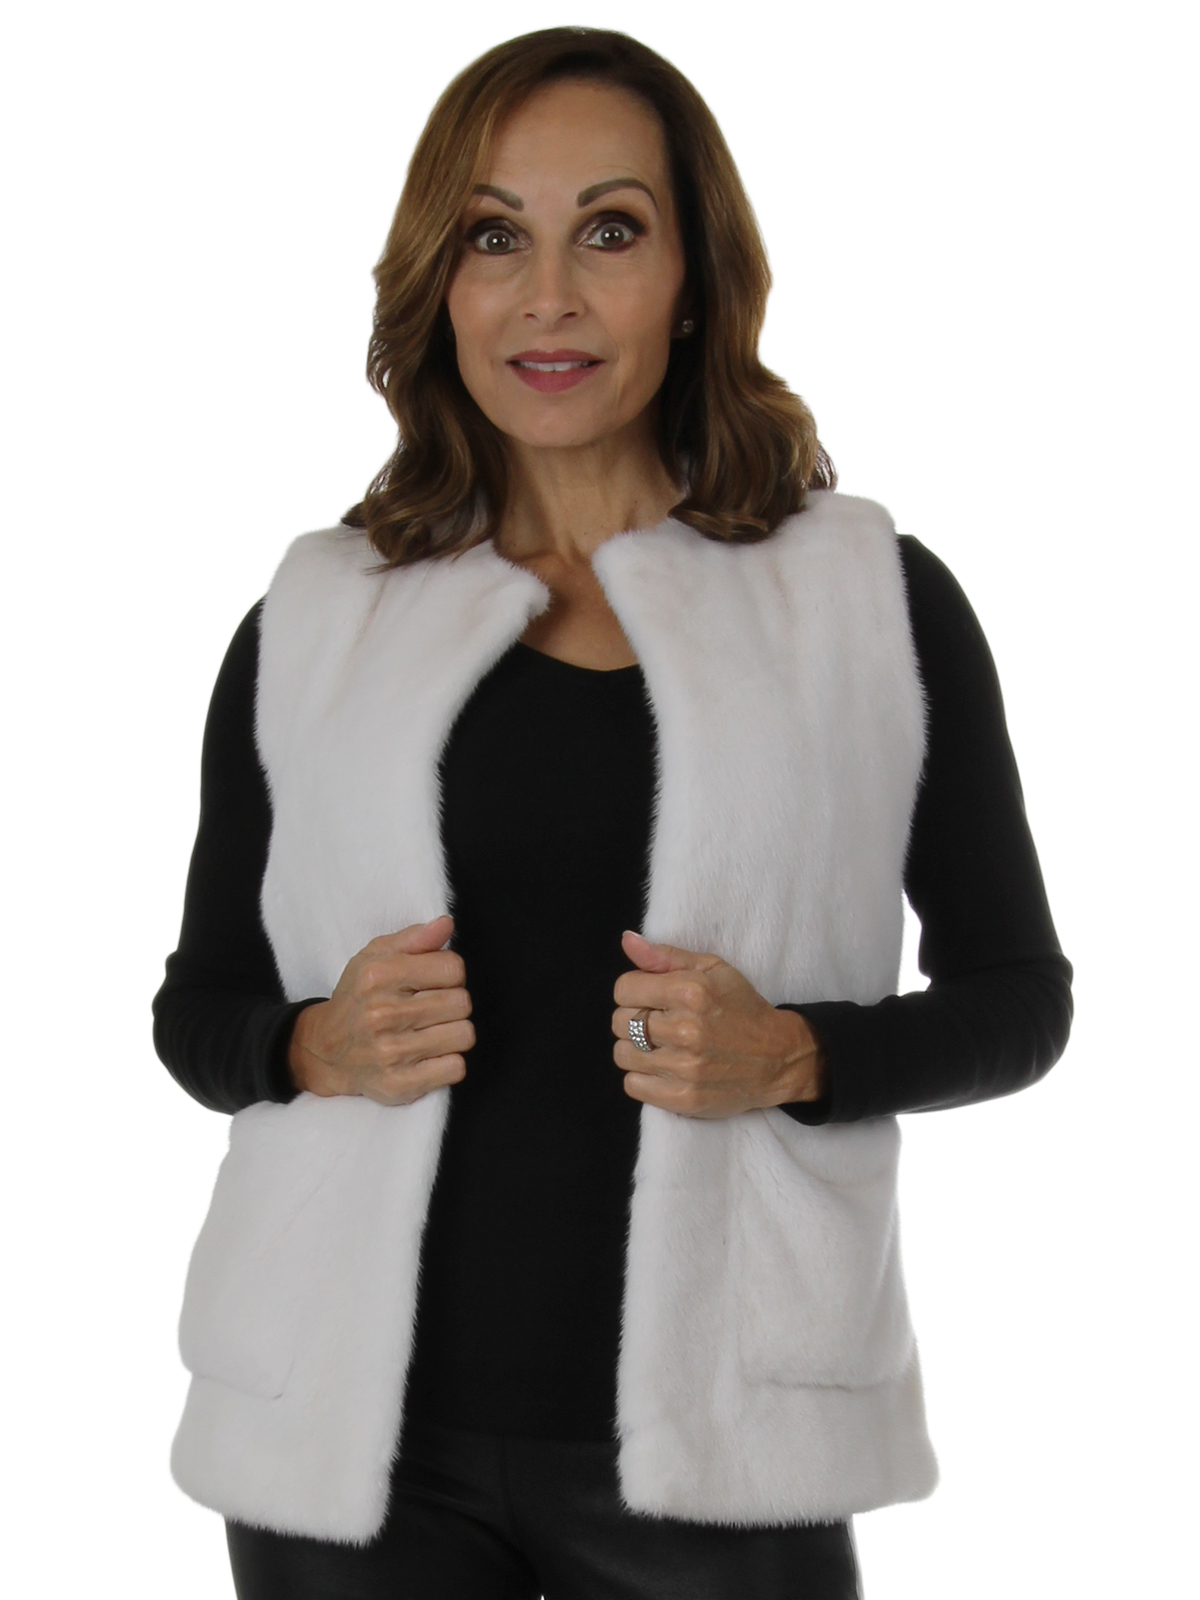 Woman's New Carolyn Rowan White Mink Fur Vest with Pockets